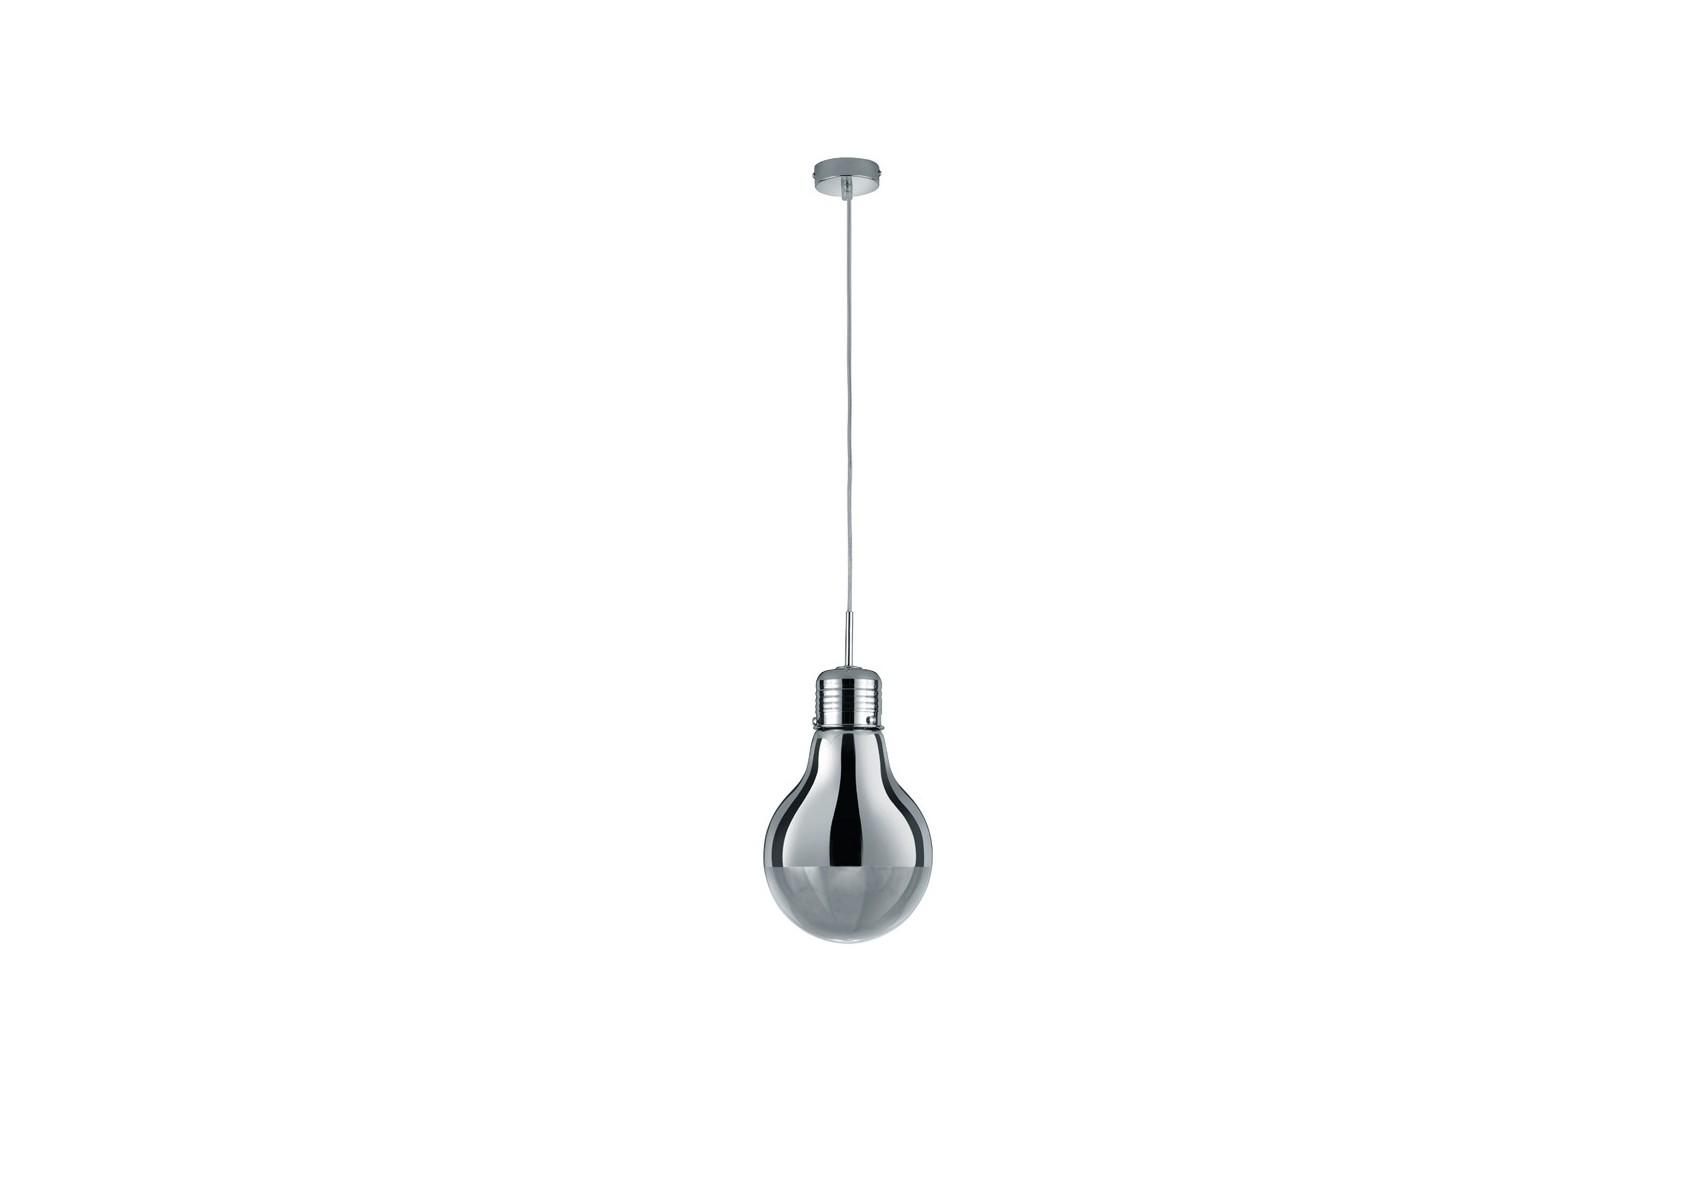 Grande suspension design edison ampoule chrom boite design - Grande suspension design ...